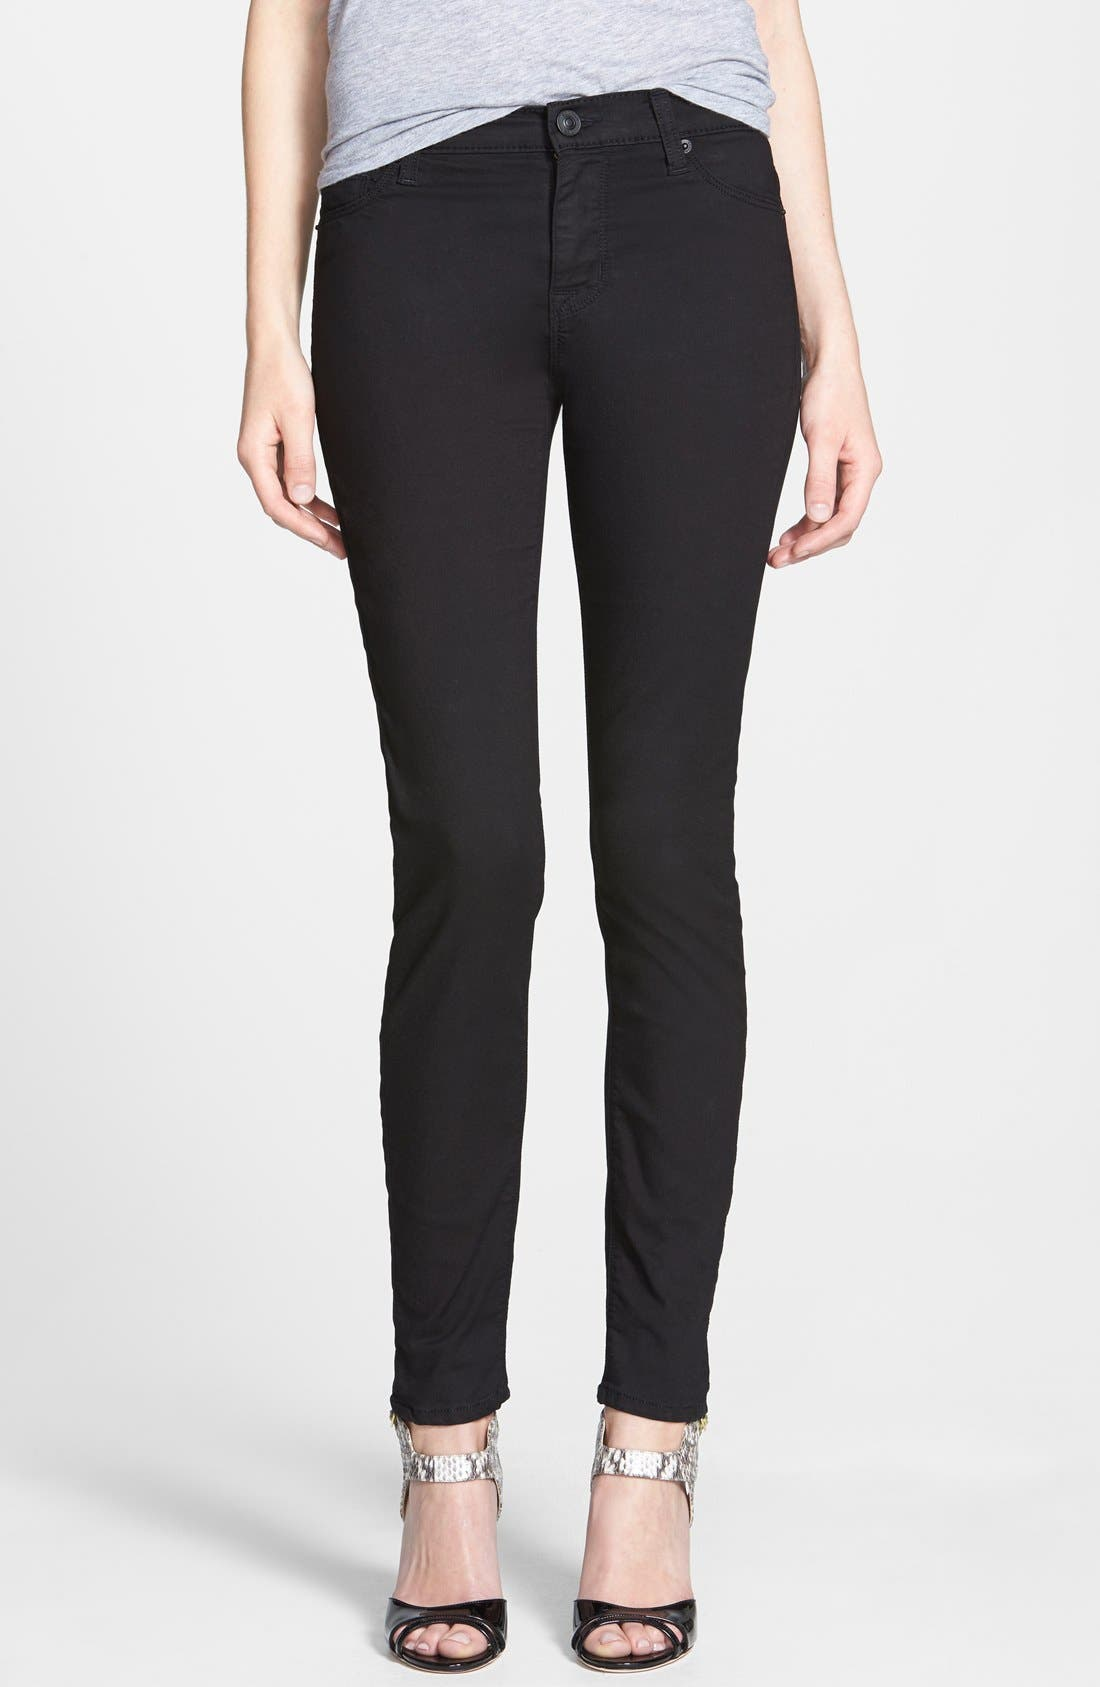 Alternate Image 1 Selected - Hudson Jeans 'Nico' Super Skinny Jeans (Melancholy)